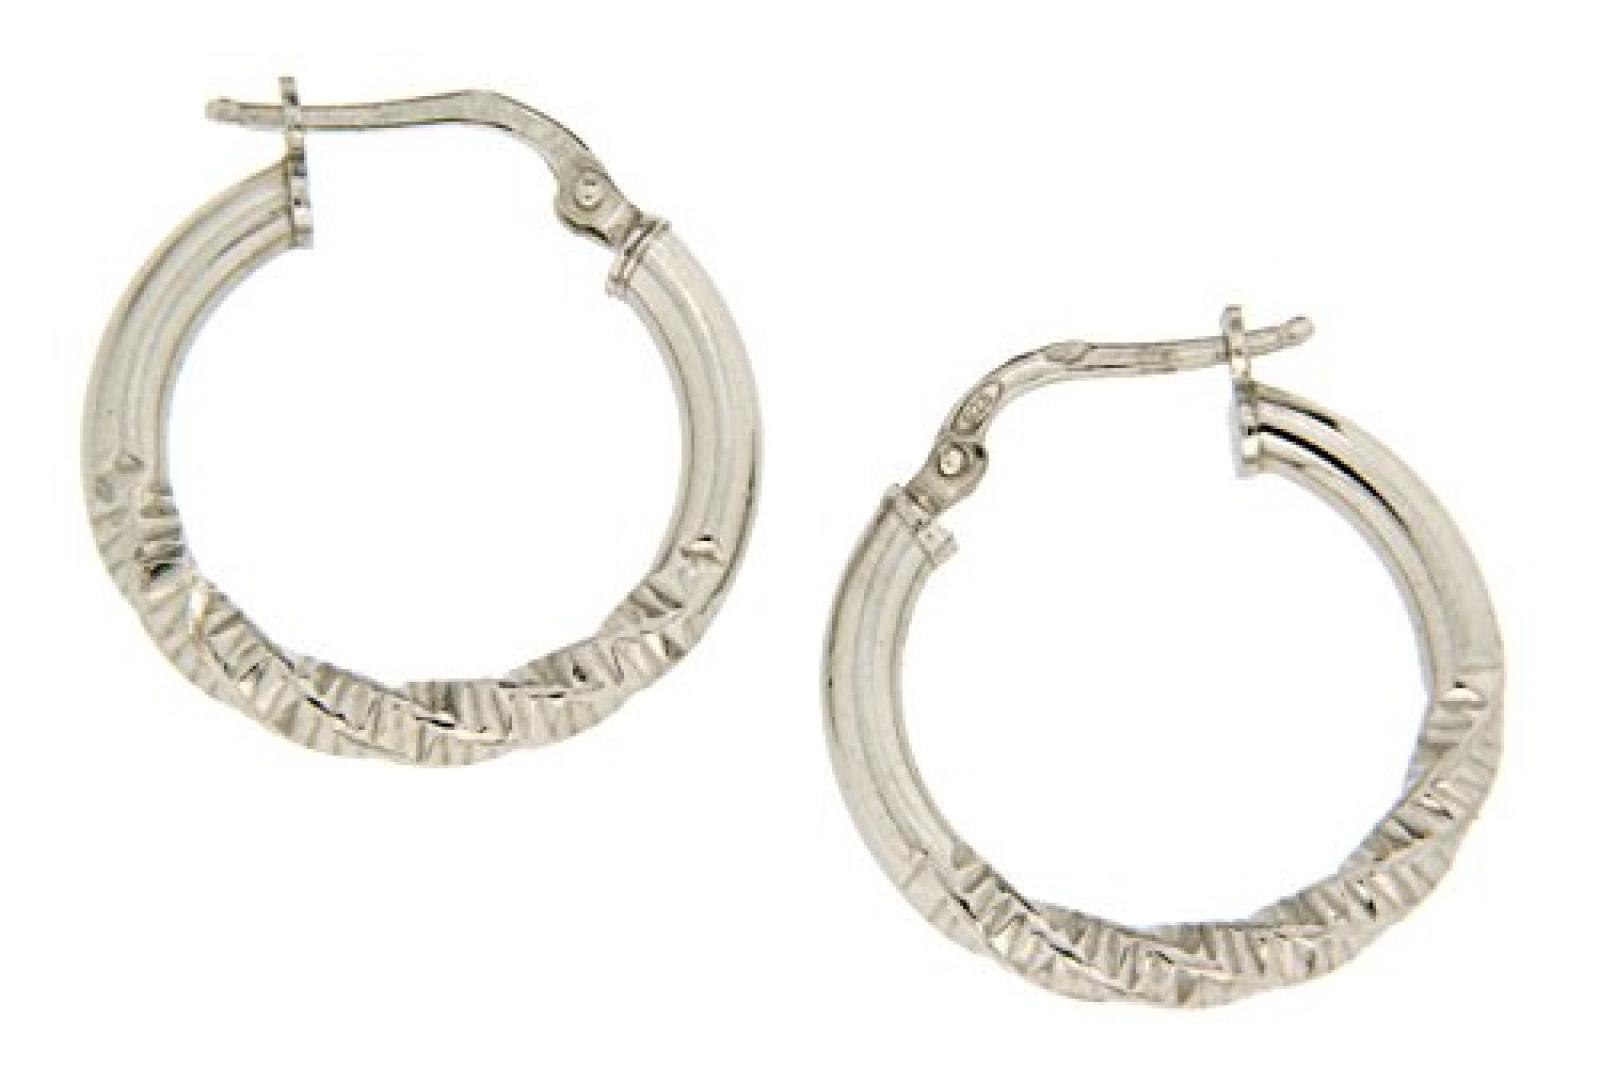 Kettenworld Damen-Creolen 925 Sterling Silber 321560